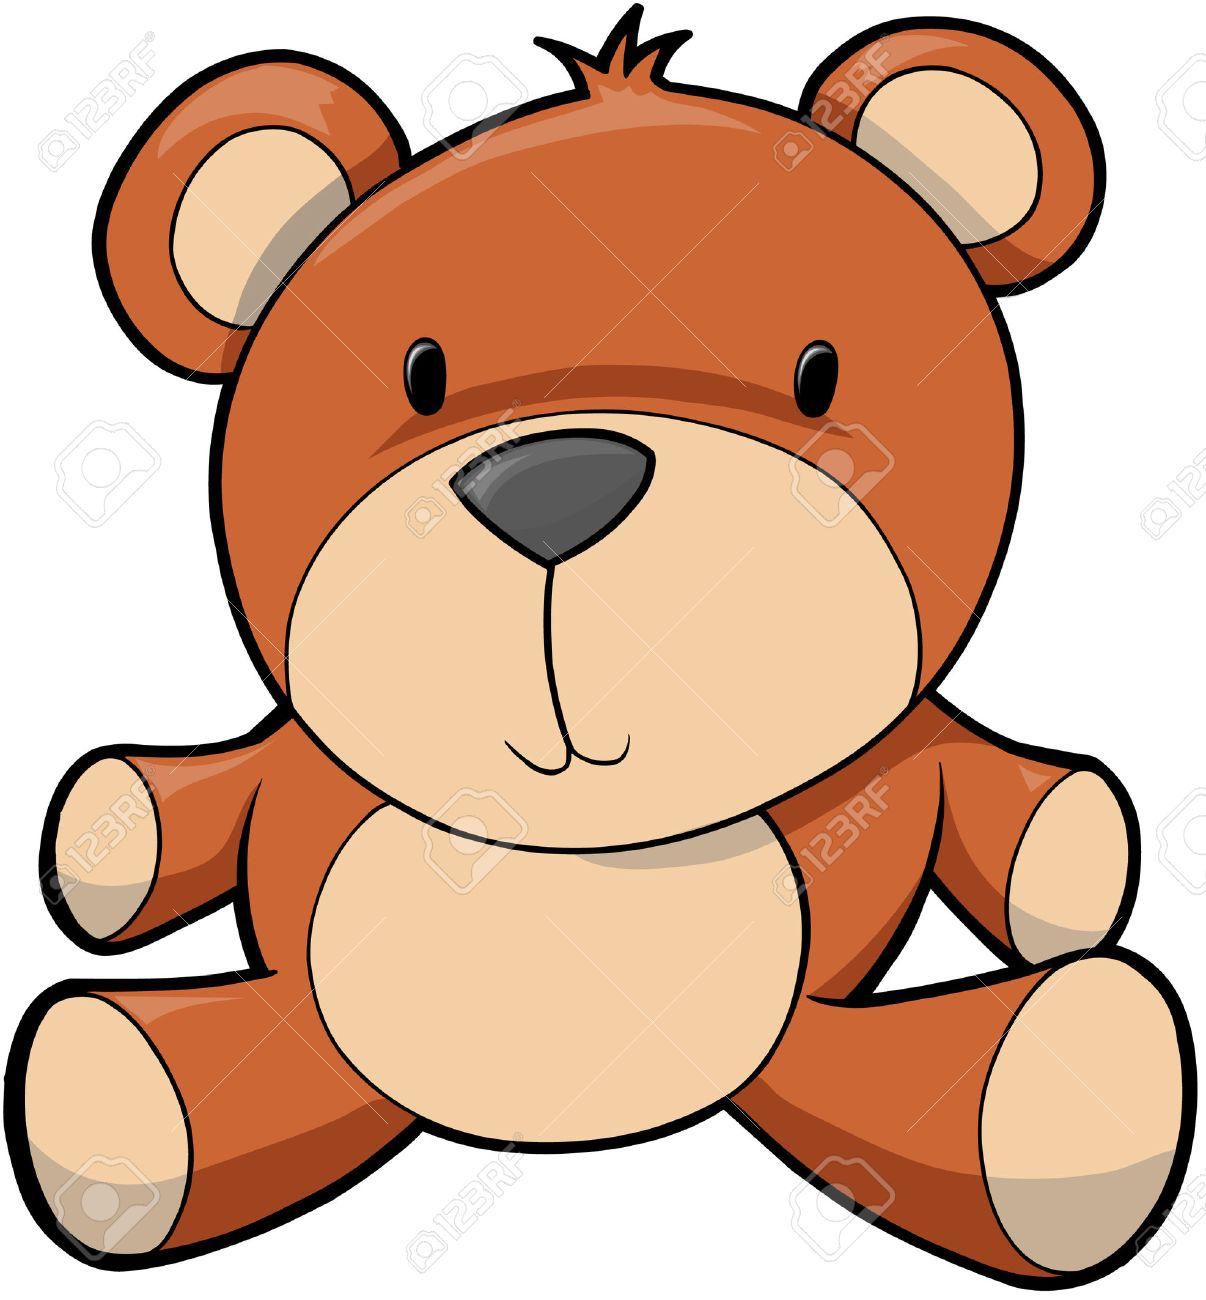 teddy bear vector illustration royalty free cliparts vectors and rh 123rf com teddy bear vector illustration teddy bear vector icon